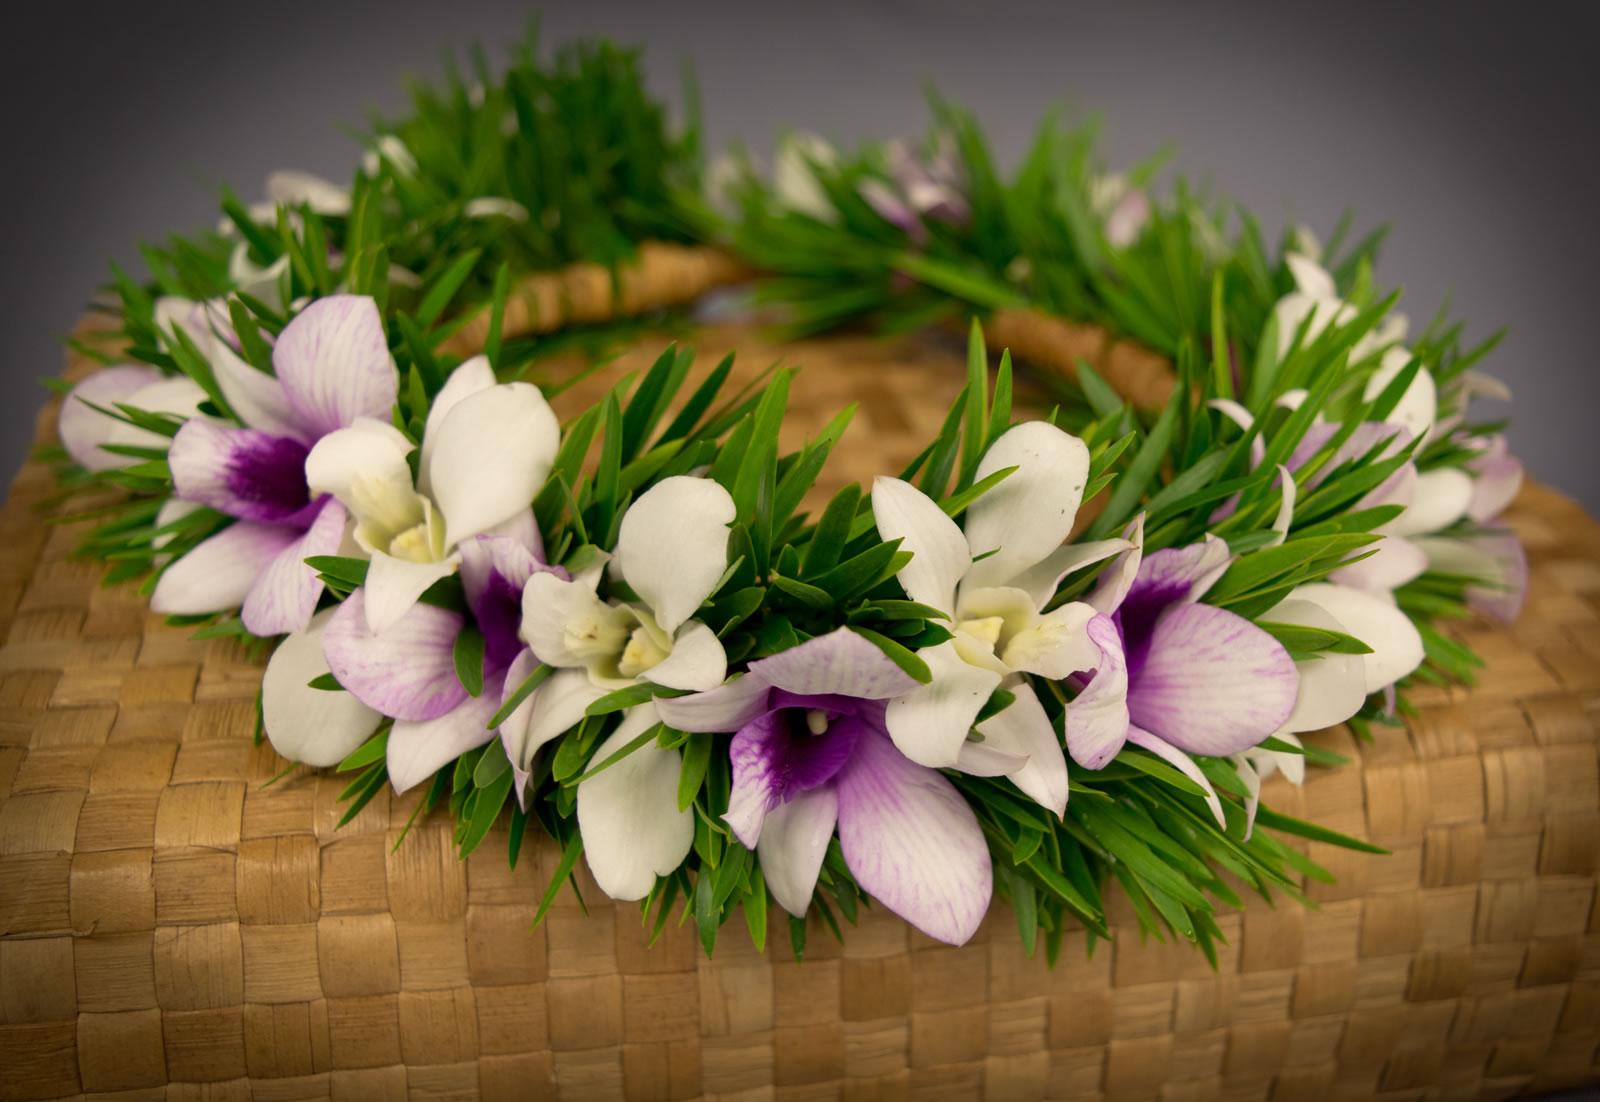 Haku orchid lei puna ohana tropical flowers leis home shop hawaiian leis haku orchid lei izmirmasajfo Images